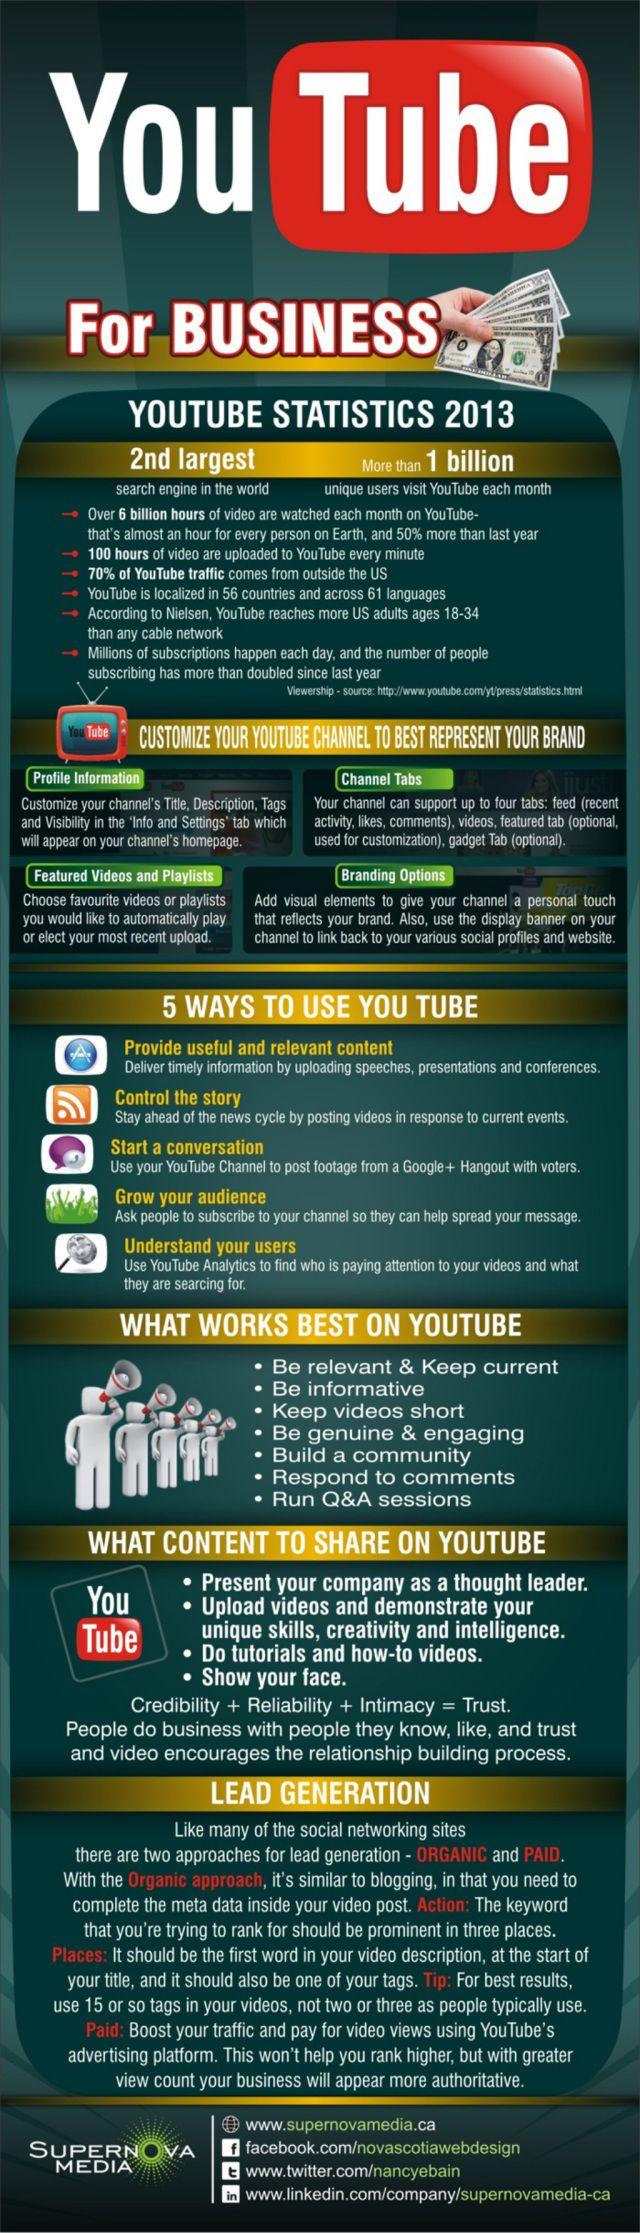 YouTube for business #infografia #infographic #socialmedia